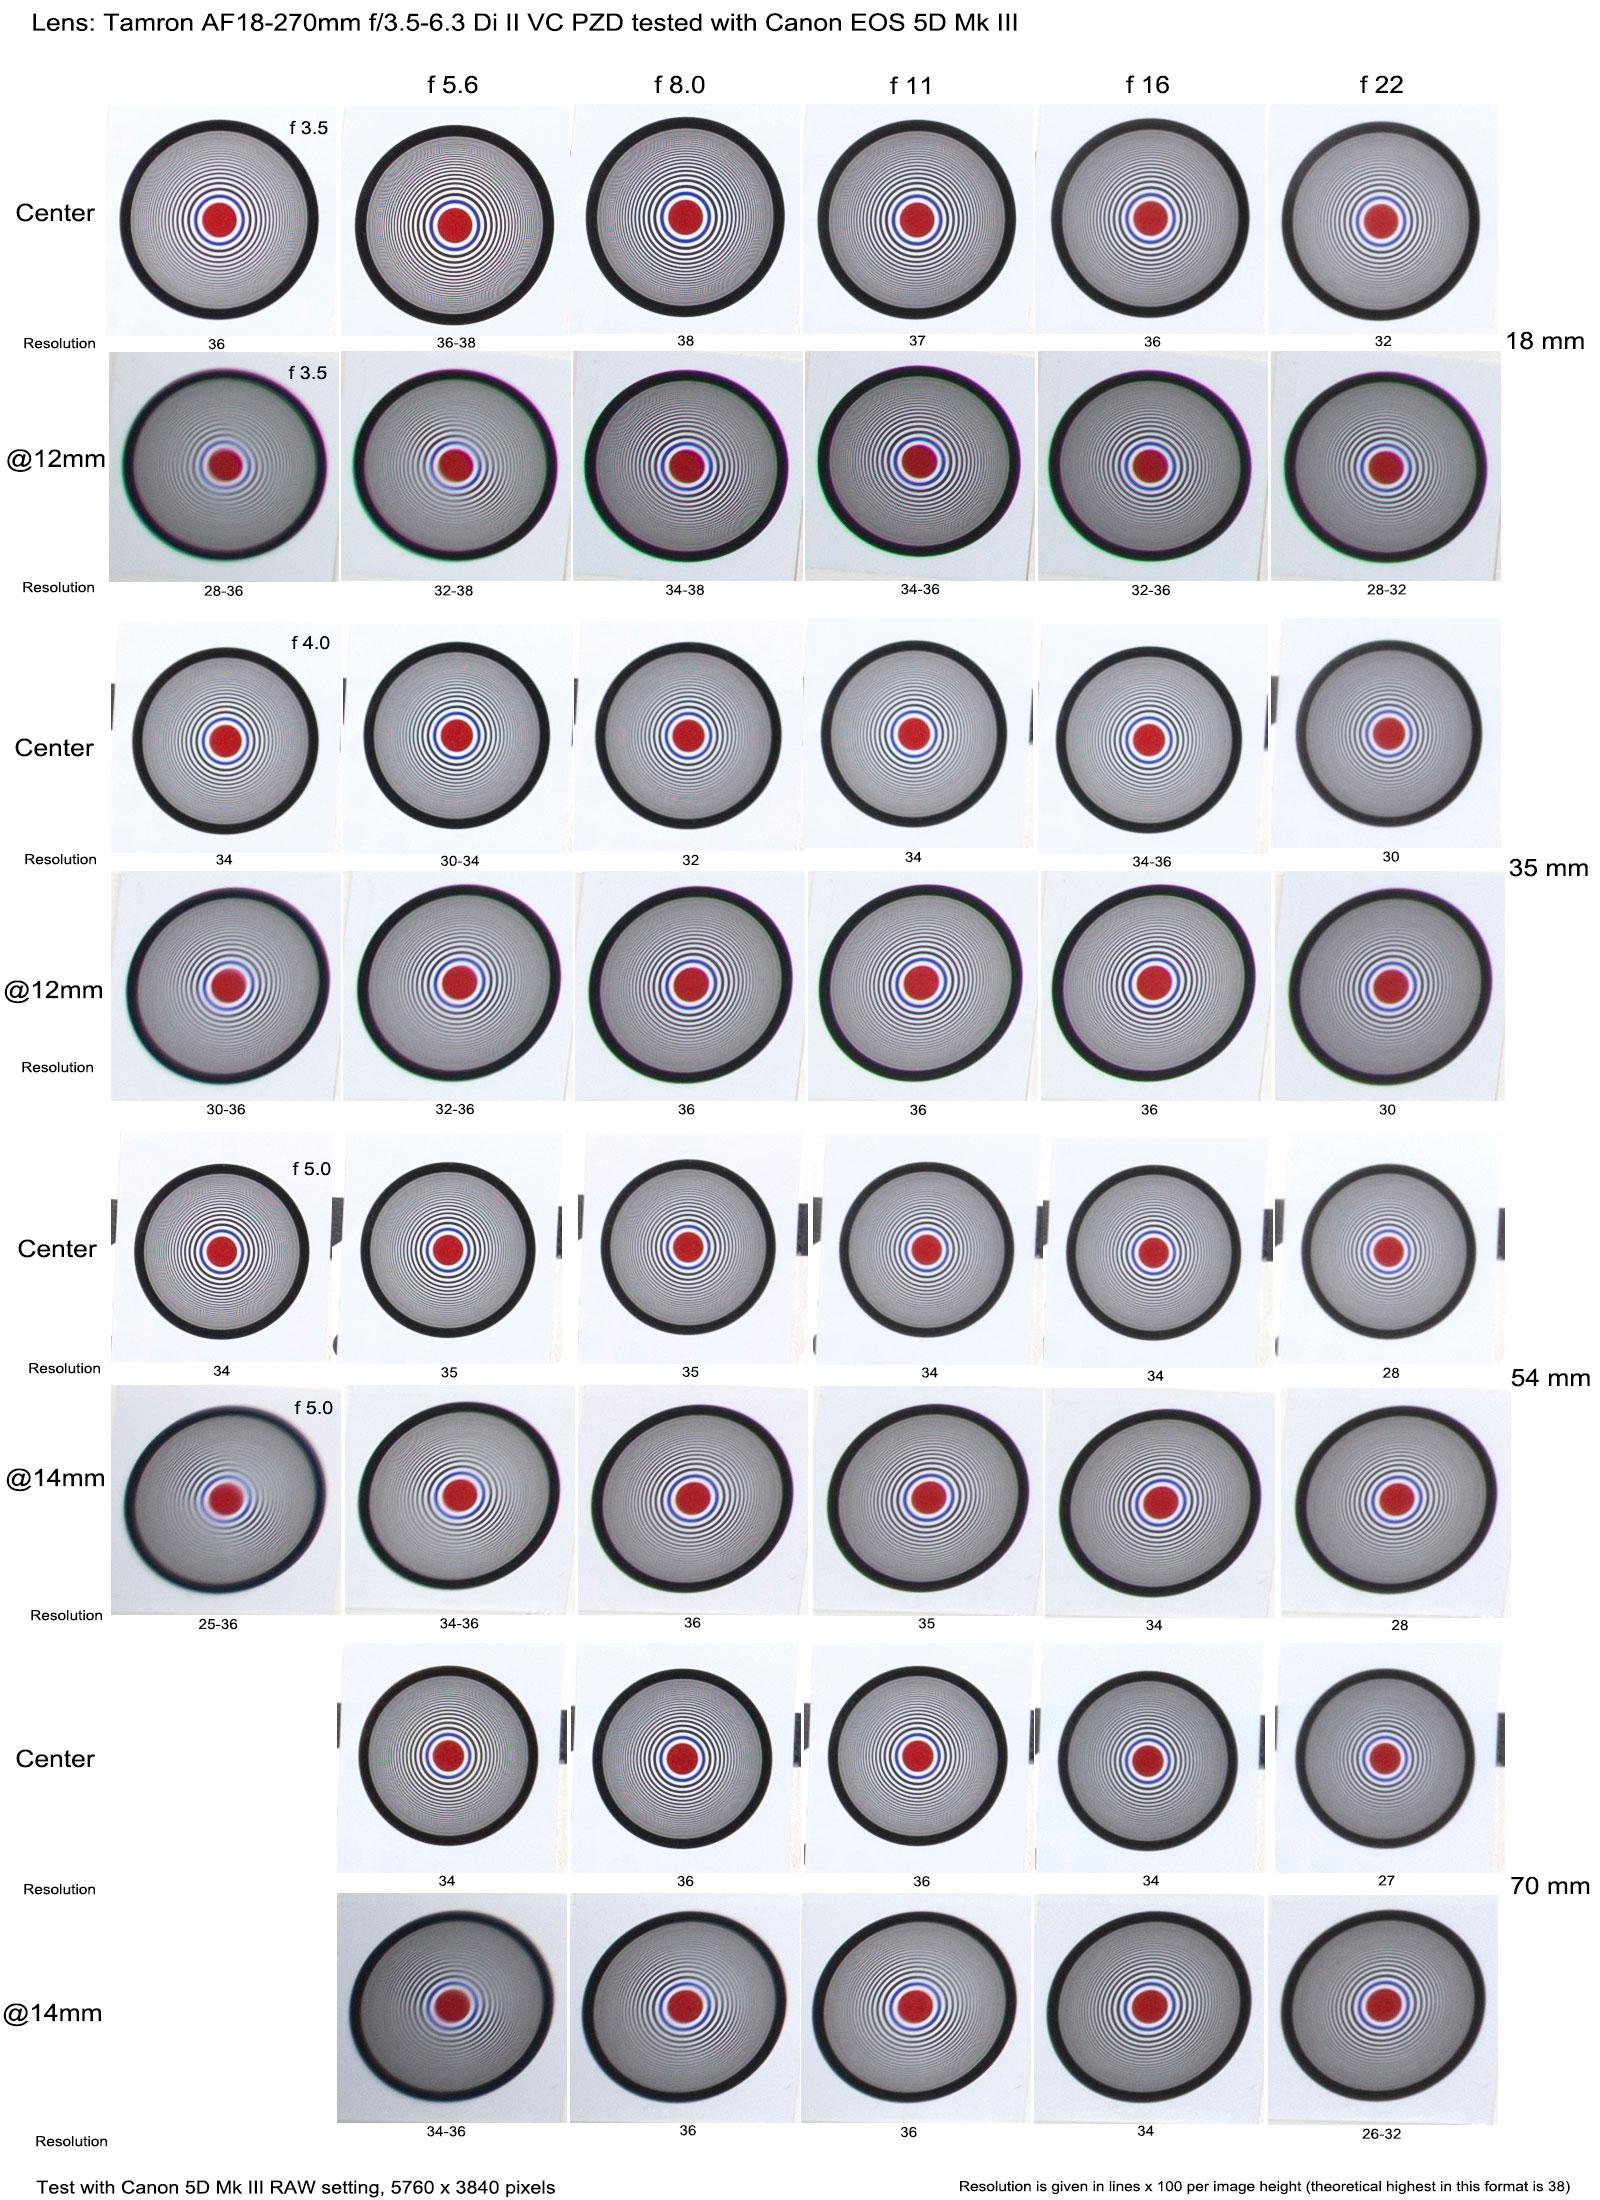 Tamron Zoom Lens AF 18-270mm f/3.5-6.3 Di II VC PZD Test Results